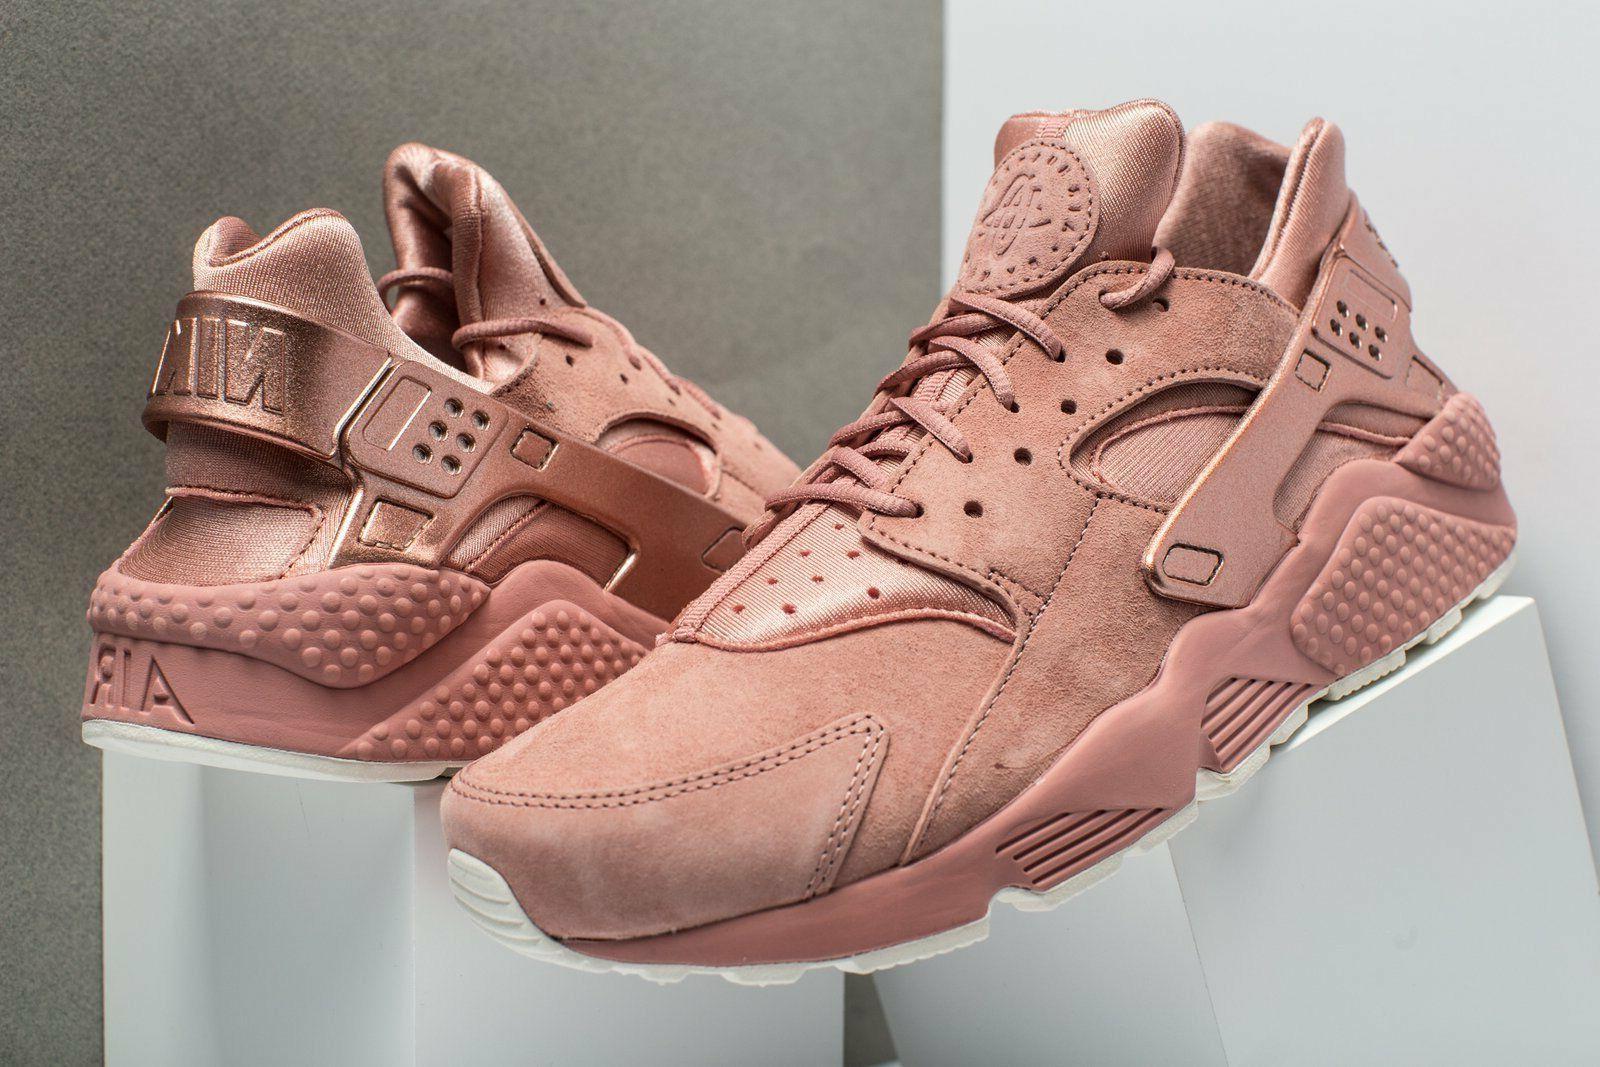 new air huarache run premium rust pink